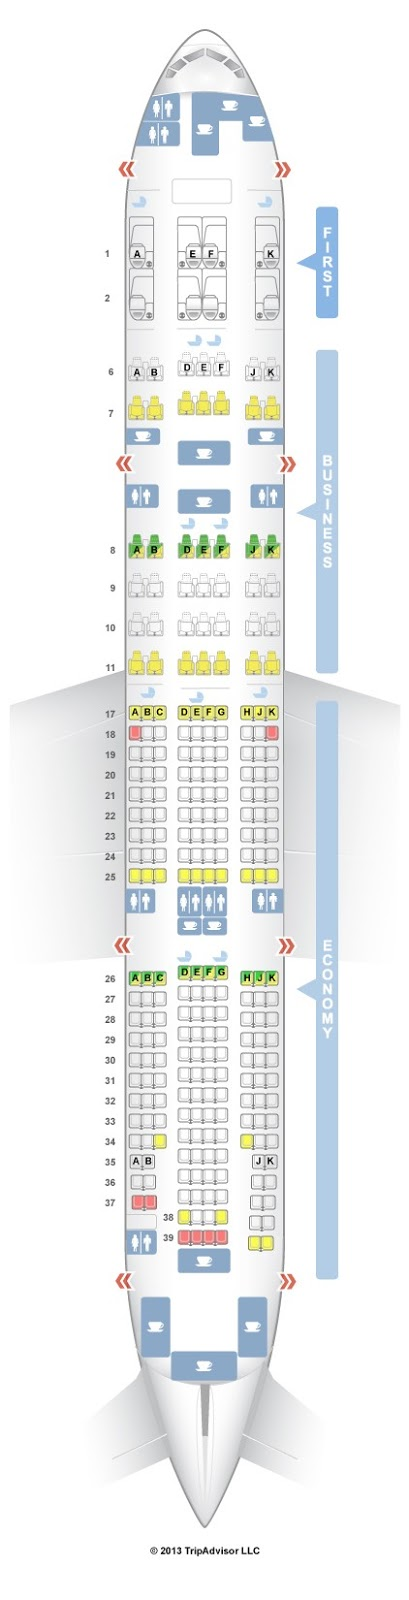 777 300er seat map cathay pacific Elegant Emirates 777 300er Seat Map Seat Inspiration 777 300er seat map cathay pacific